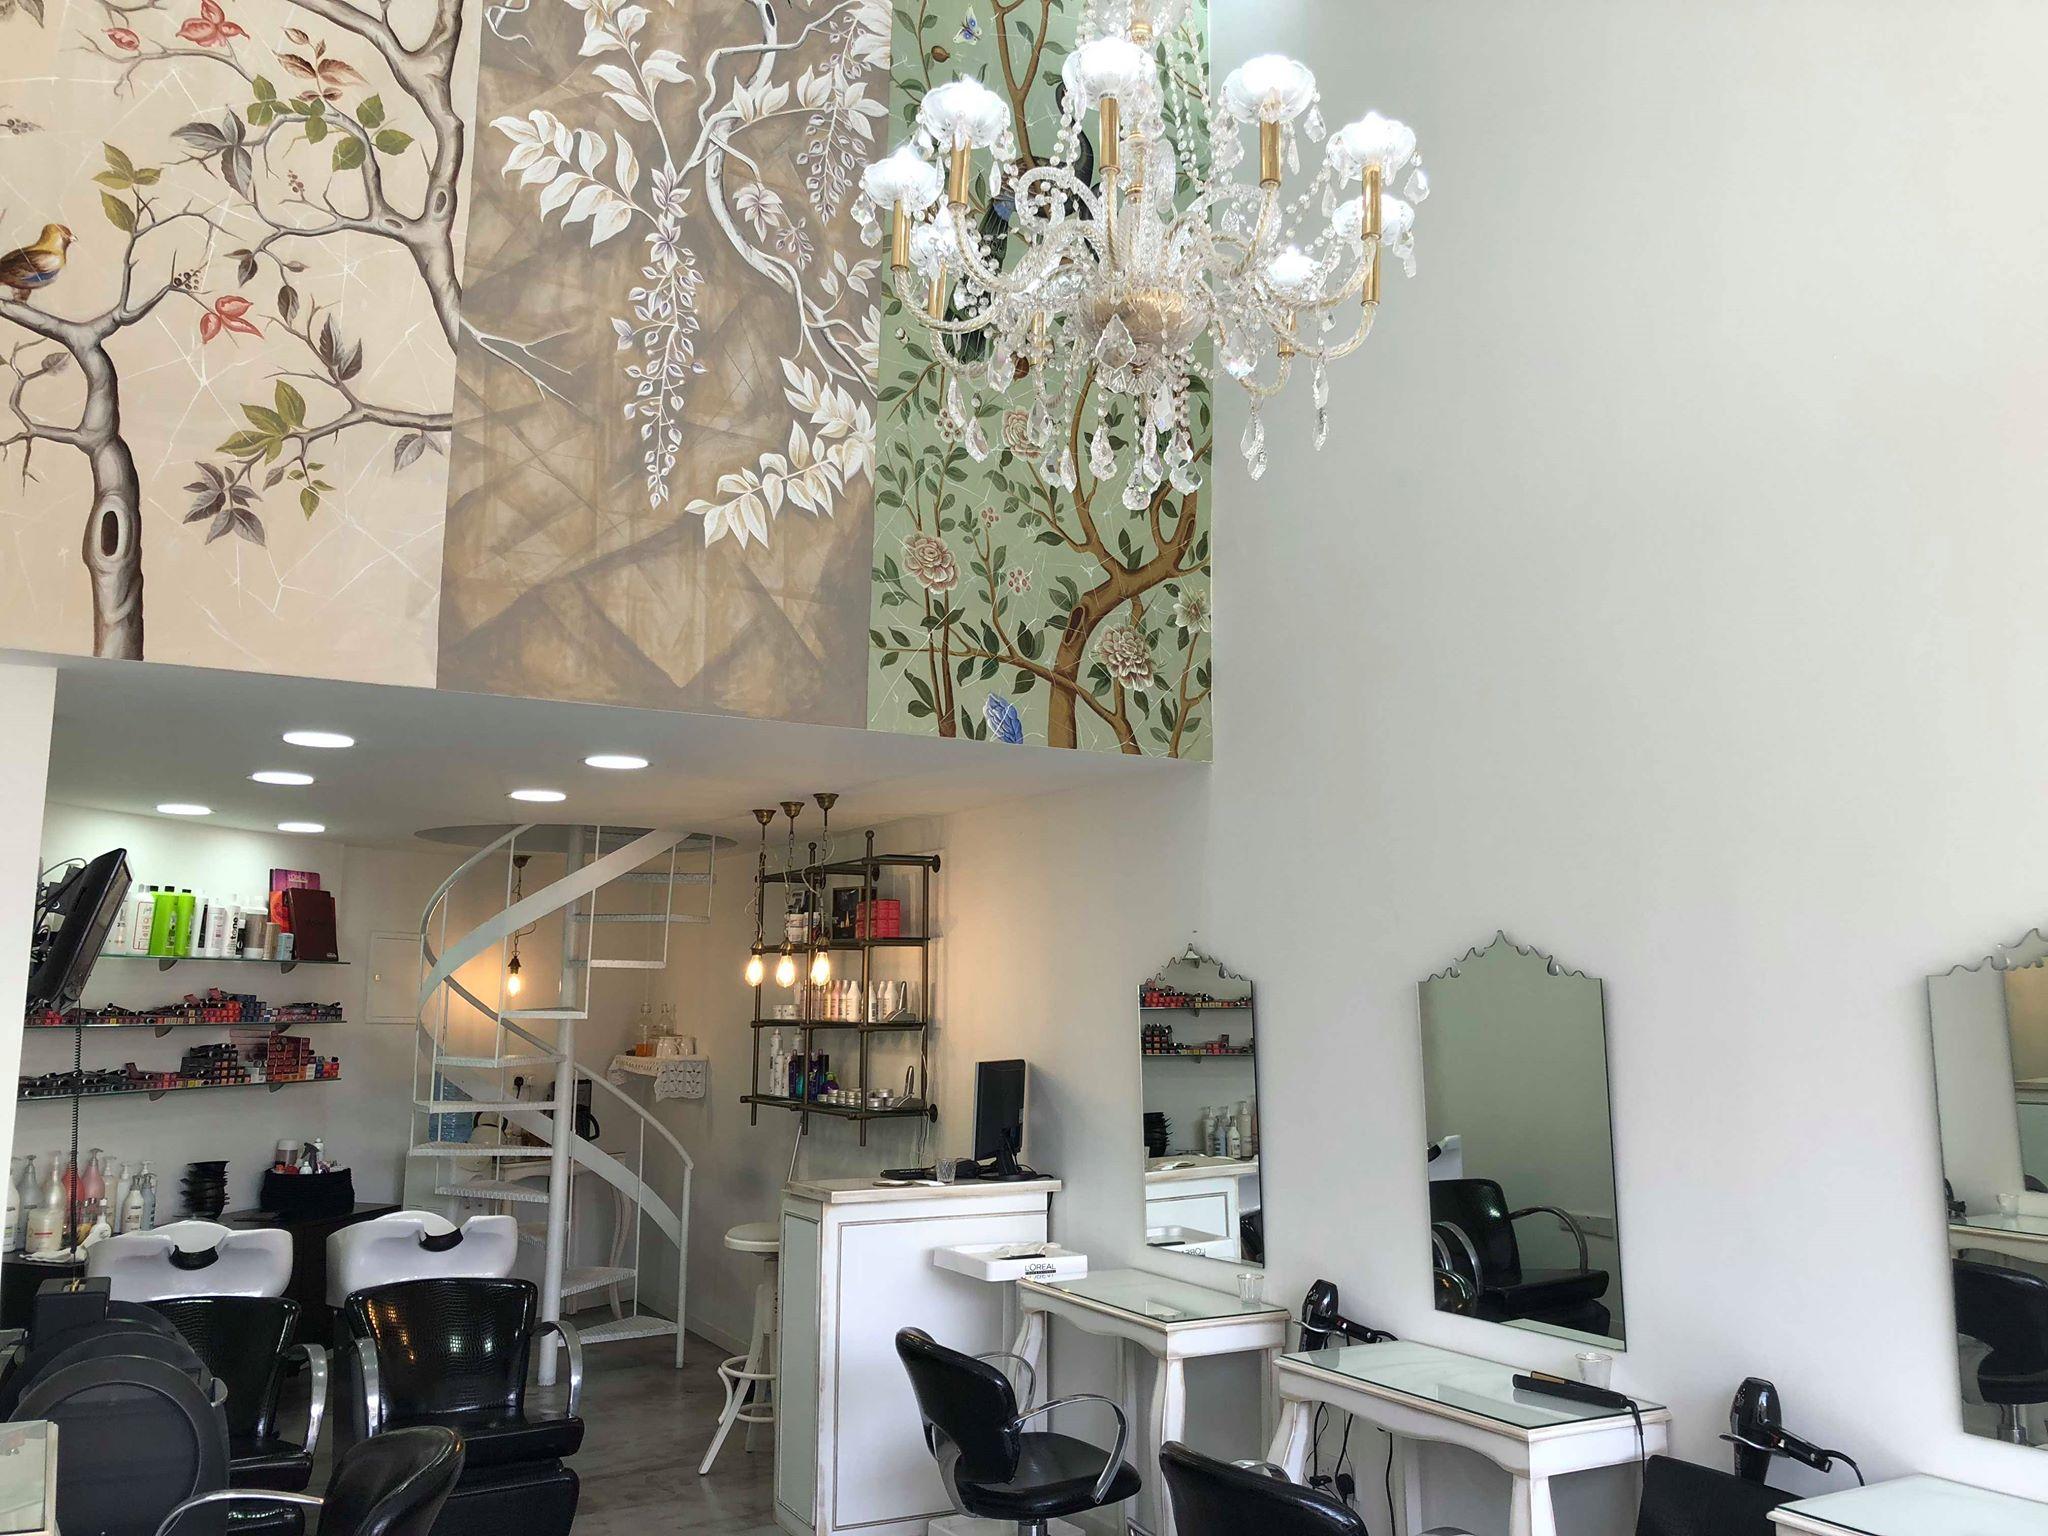 Momos Hair Studio: Το νέο κομμωτήριο στην καρδιά της Λάρνακας